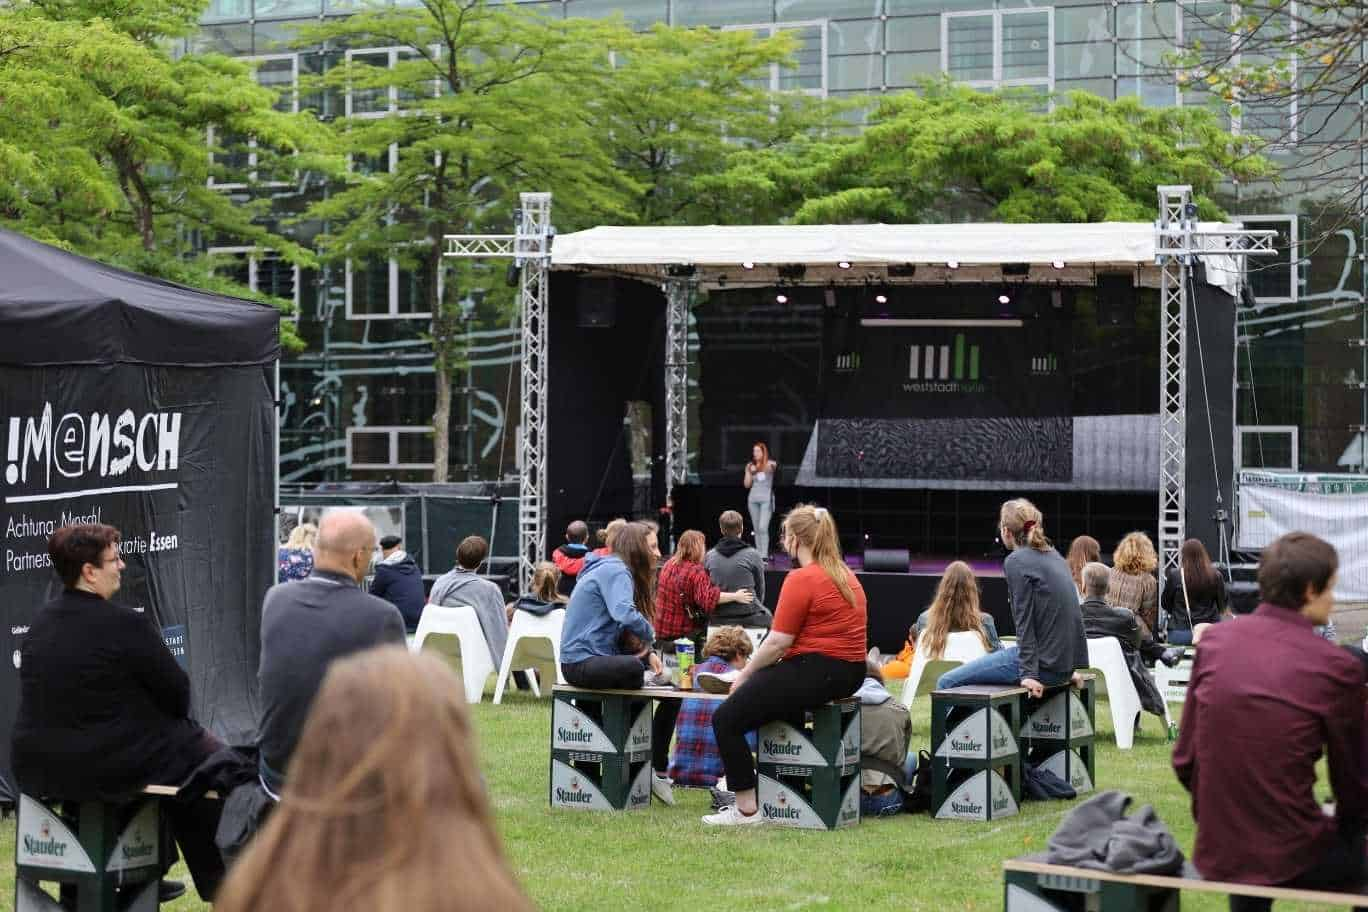 Sicht auf die Bühne beim Weststadtstory Poetry Slam Open Air